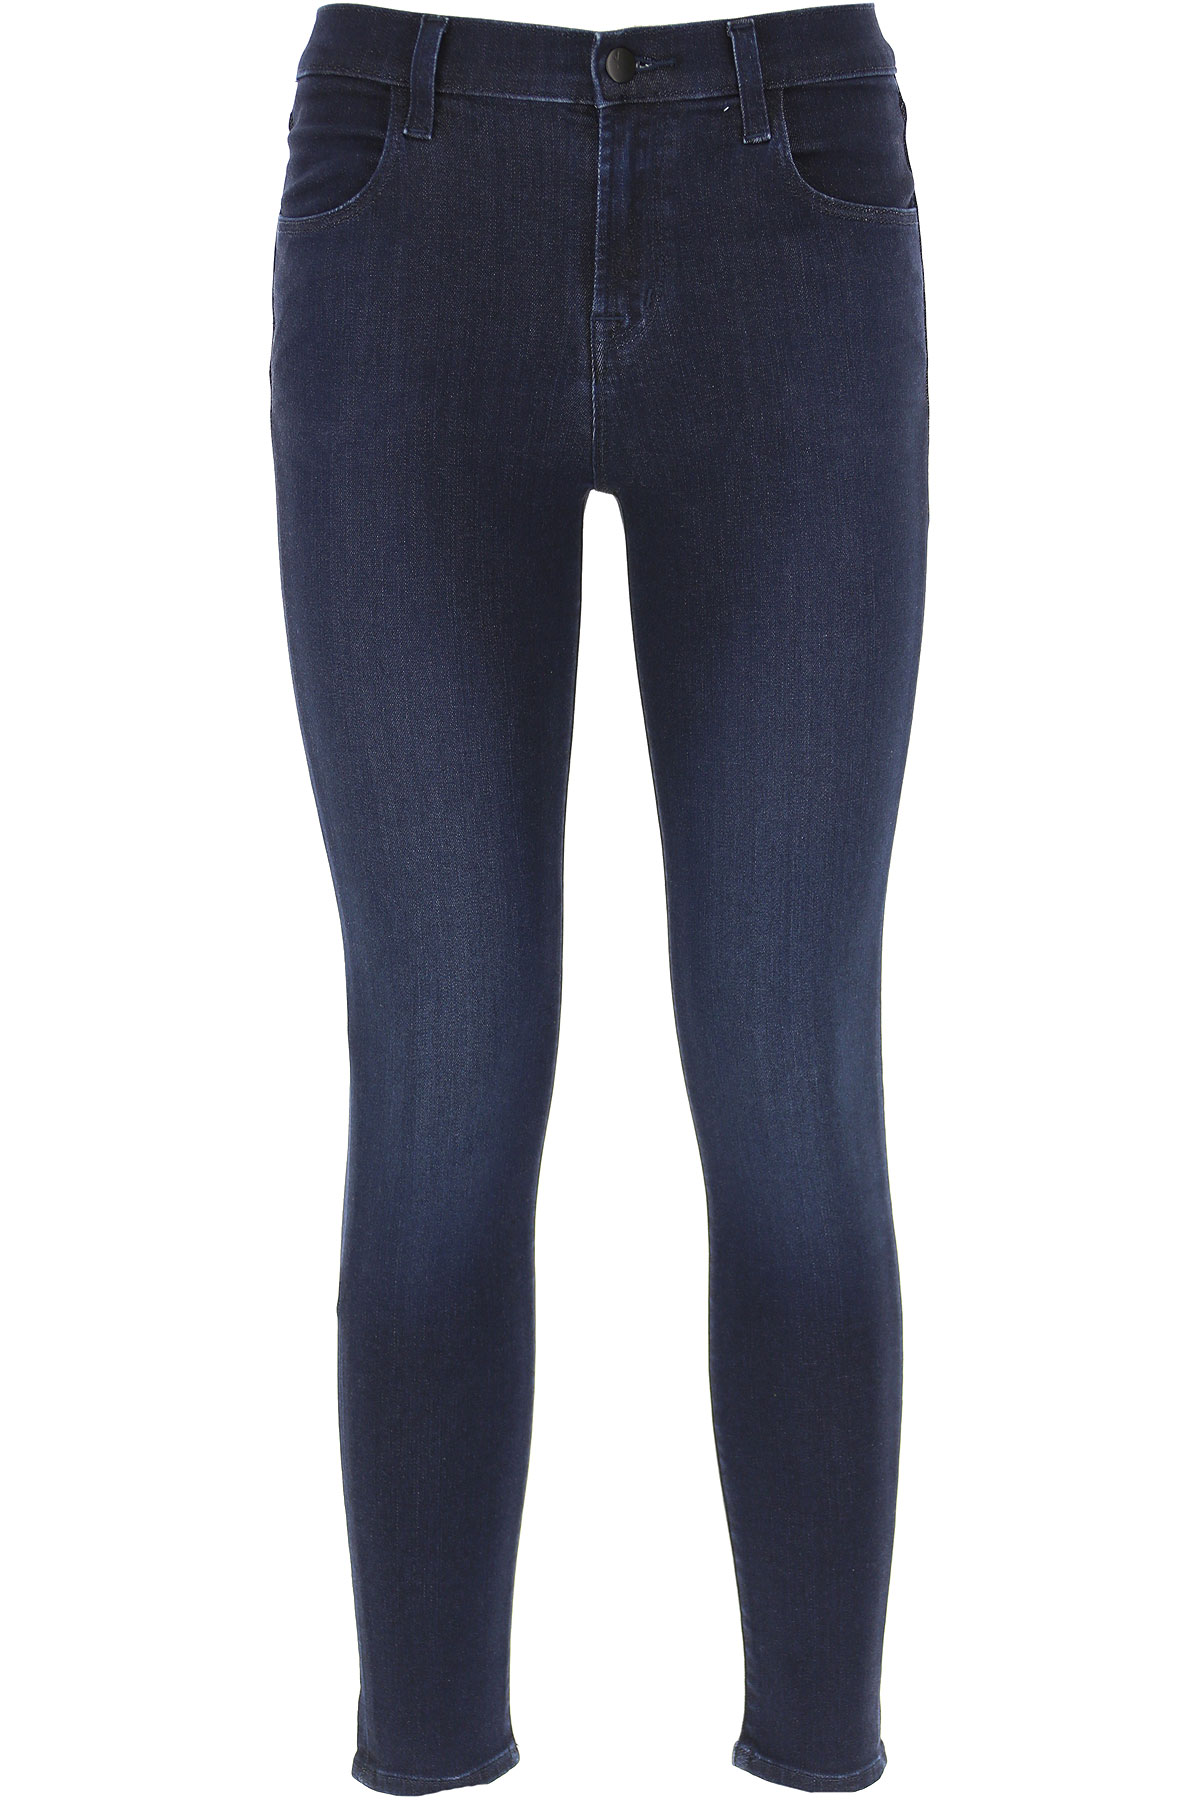 J Brand Jeans On Sale, Dark Blue, Viscose, 2019, 24 25 26 27 28 29 30